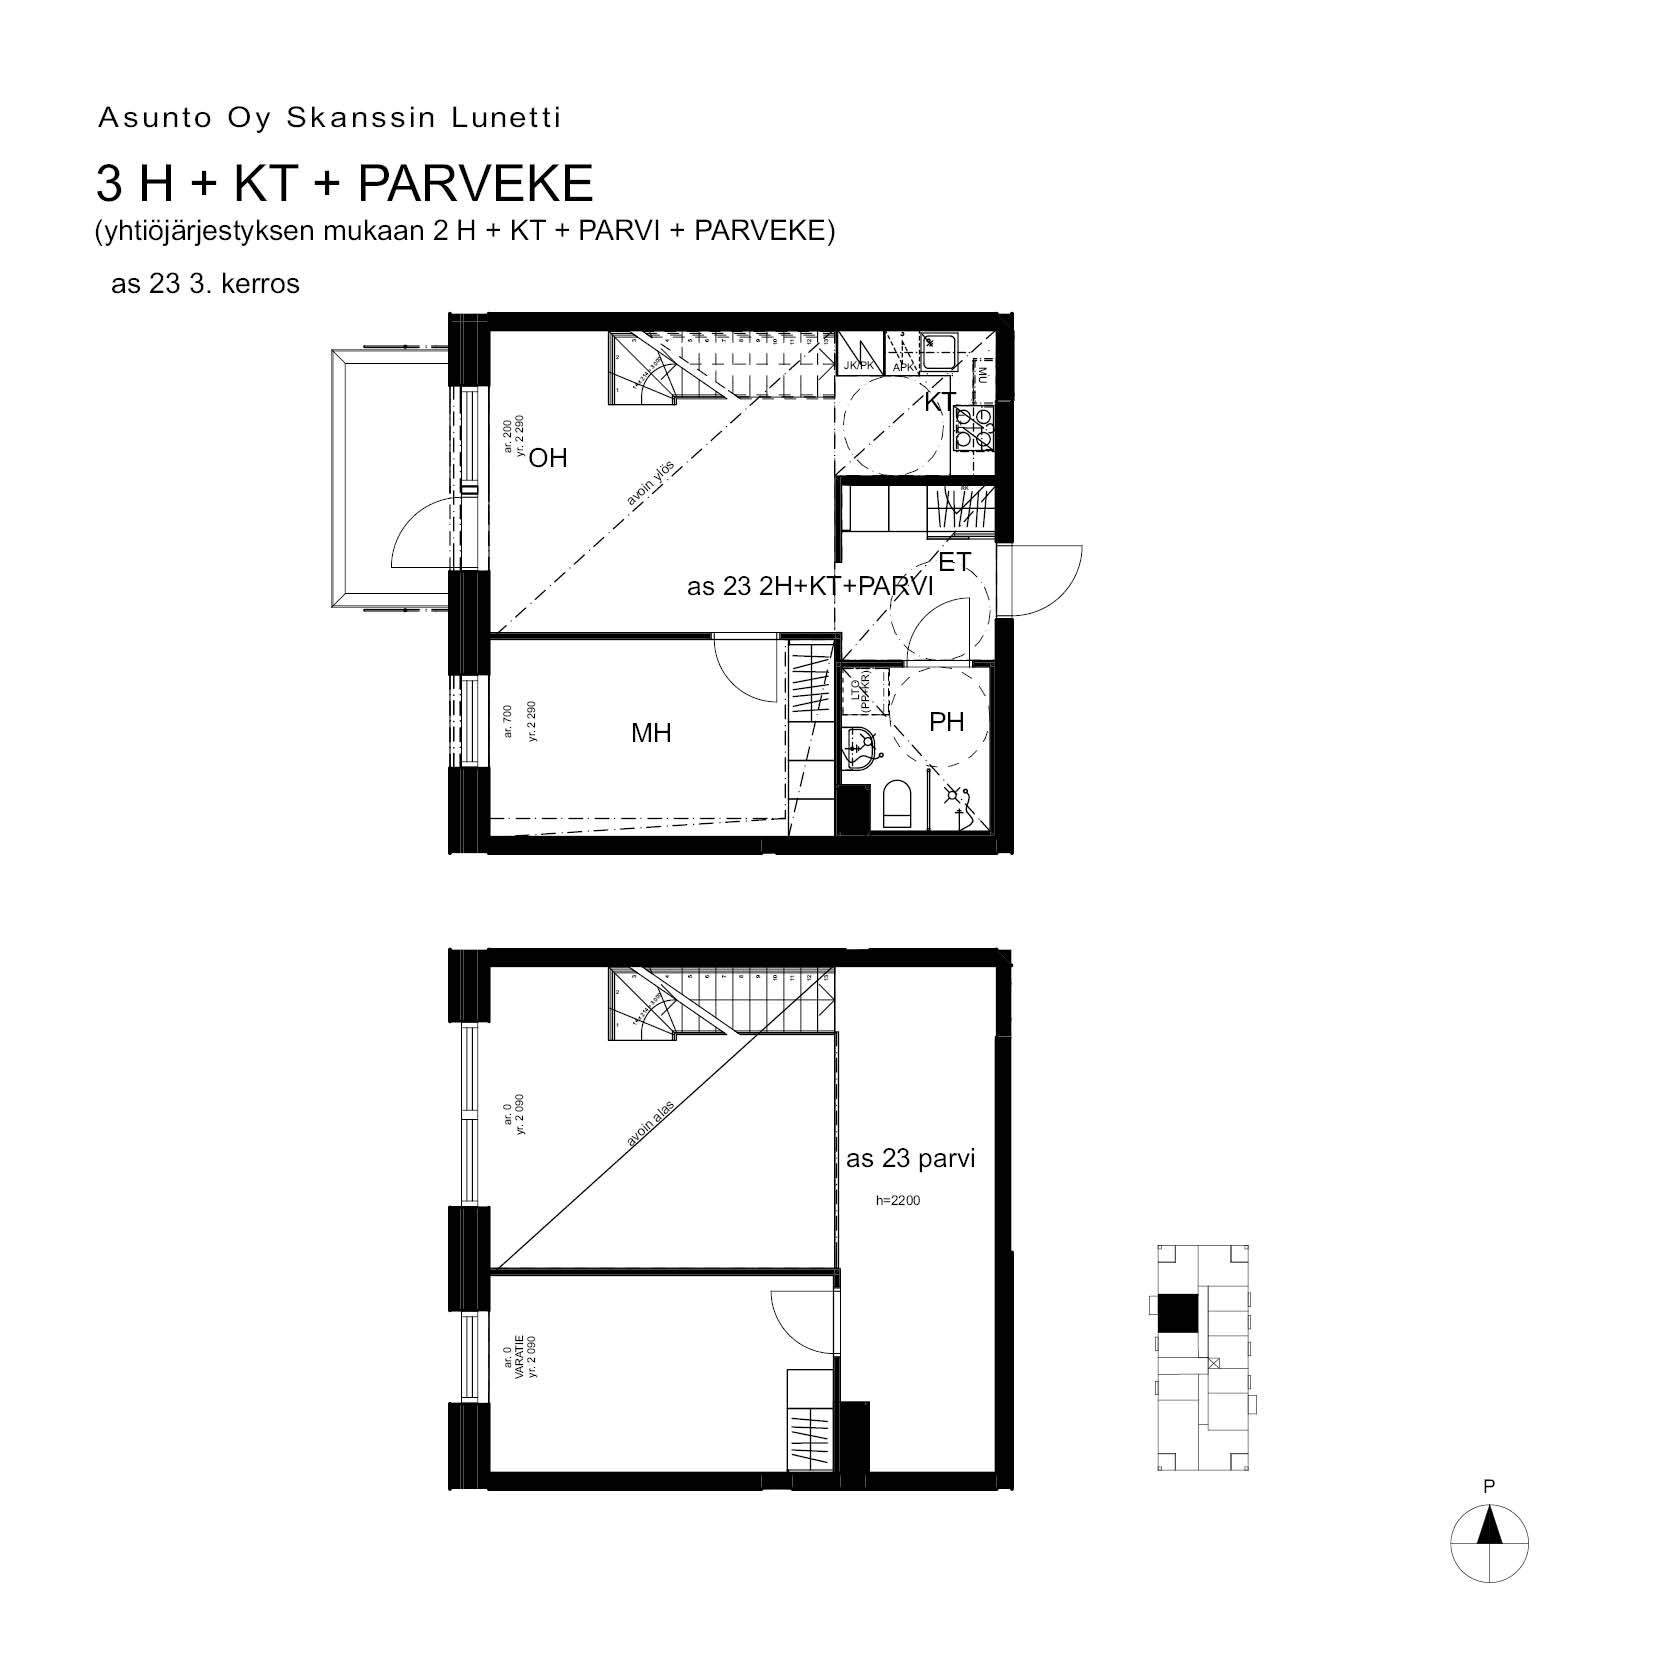 A23, 68.5 m<sup>2</sup>, 2H+KT+PARVI+parveke